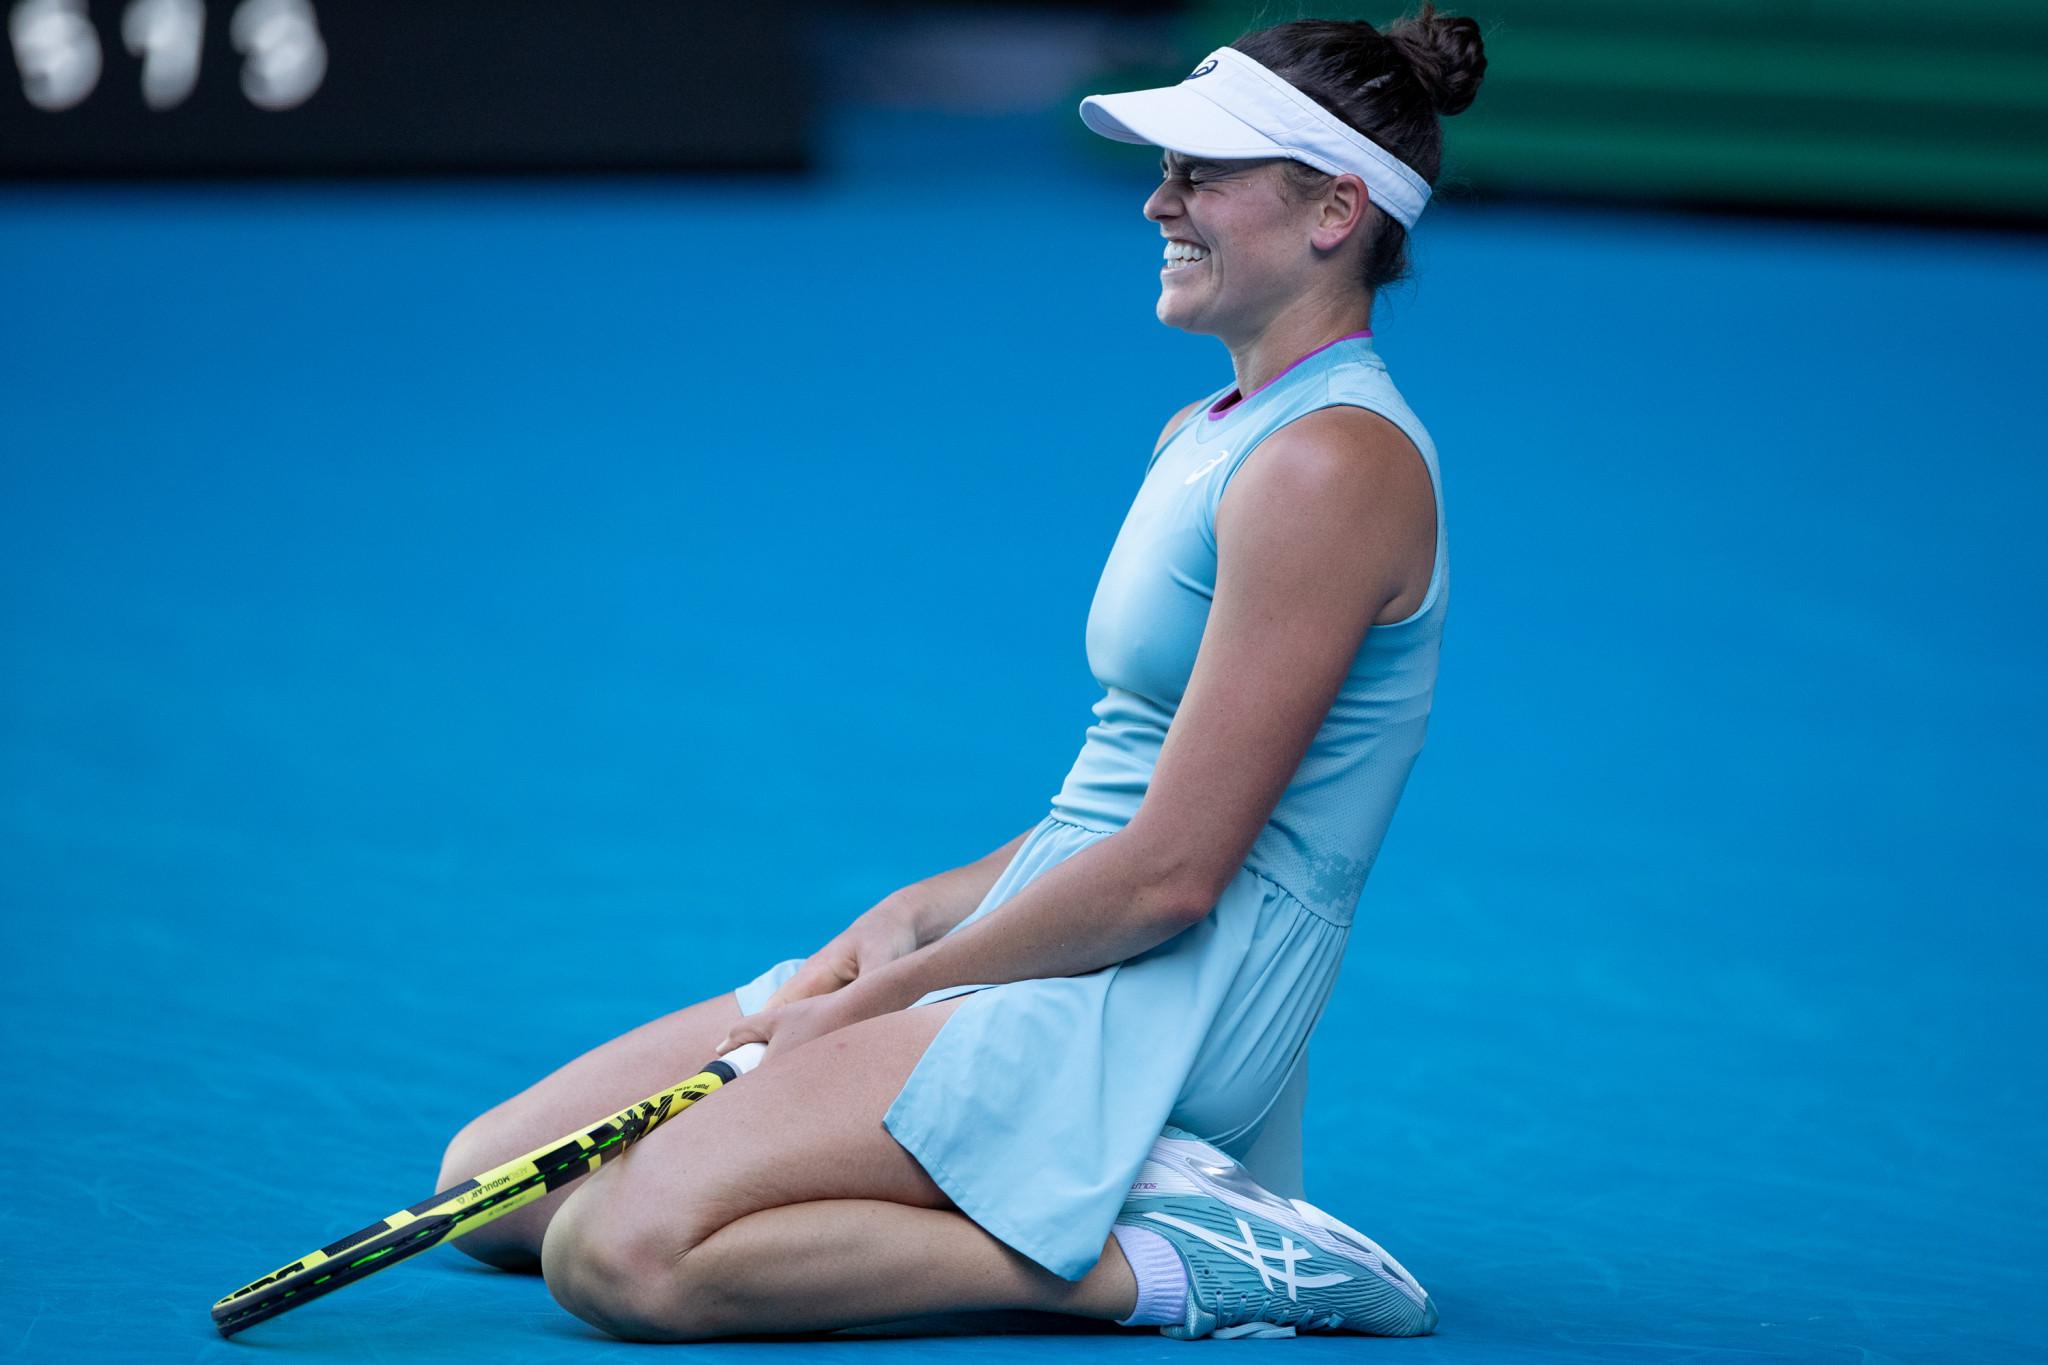 Jennifer Brady progressed to her first Grand Slam final ©Getty Images